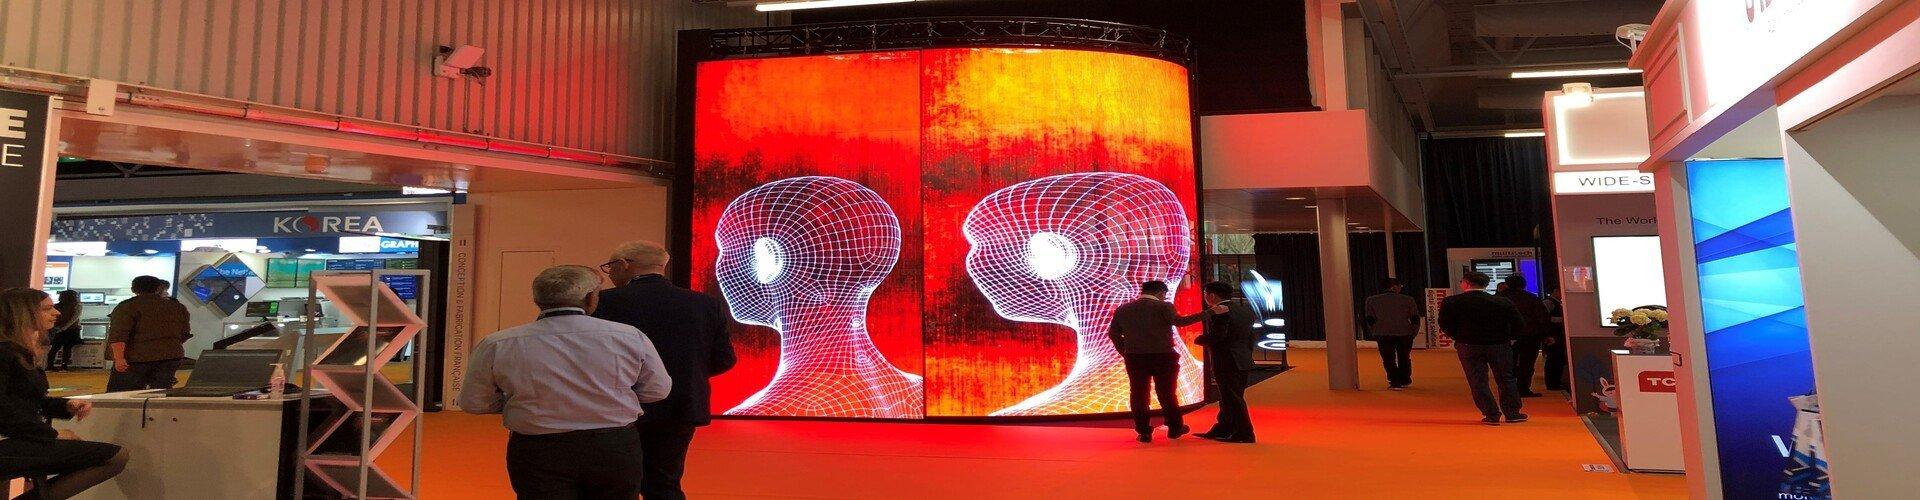 Trade Show LED Display